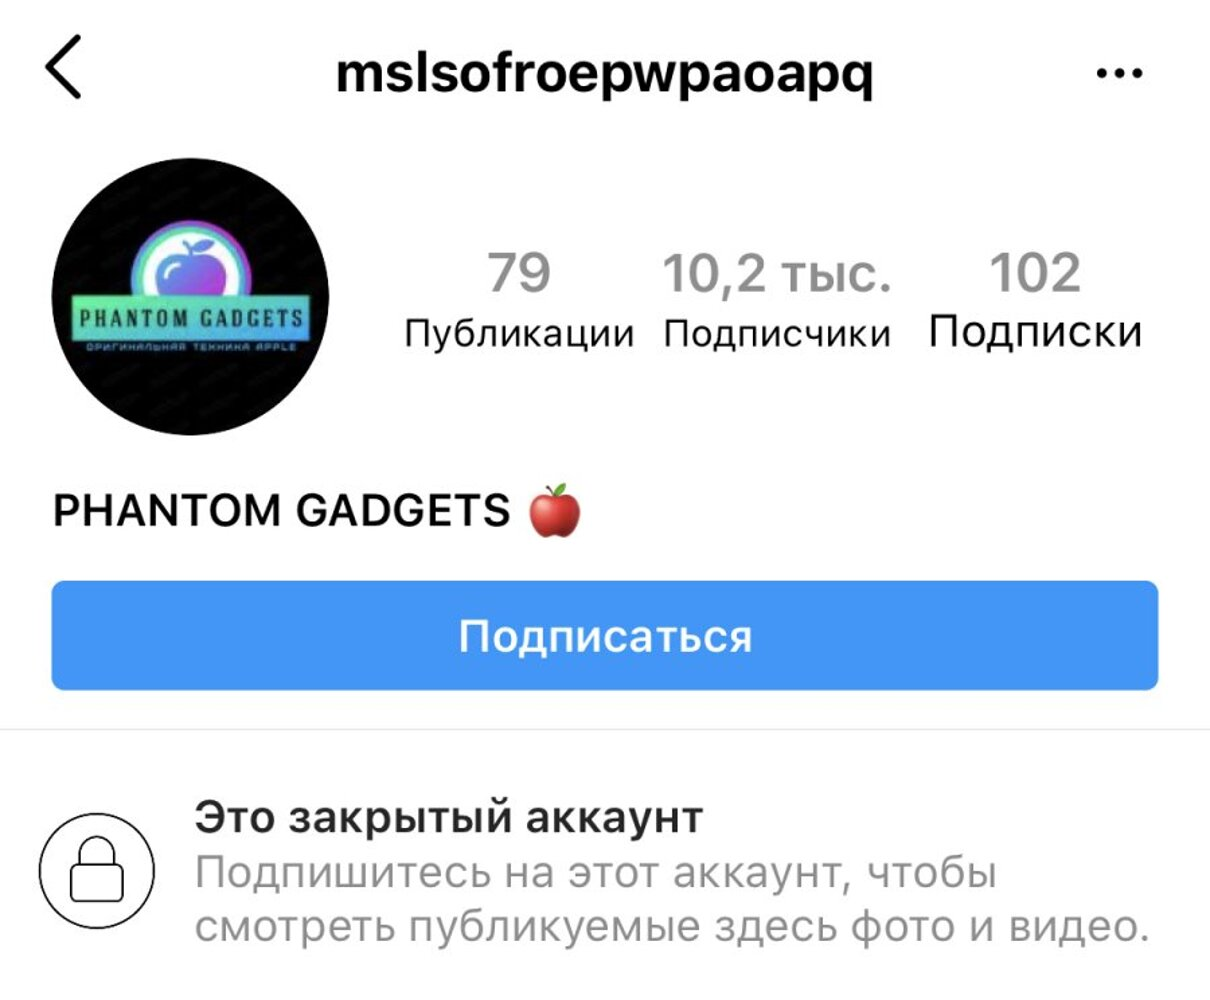 Жалоба-отзыв: Icosmos_apple ( в Инстаграмм ) - Https://instagram.com/icosmos_apple? igshid=1oc7px87b03ue.  Фото №5